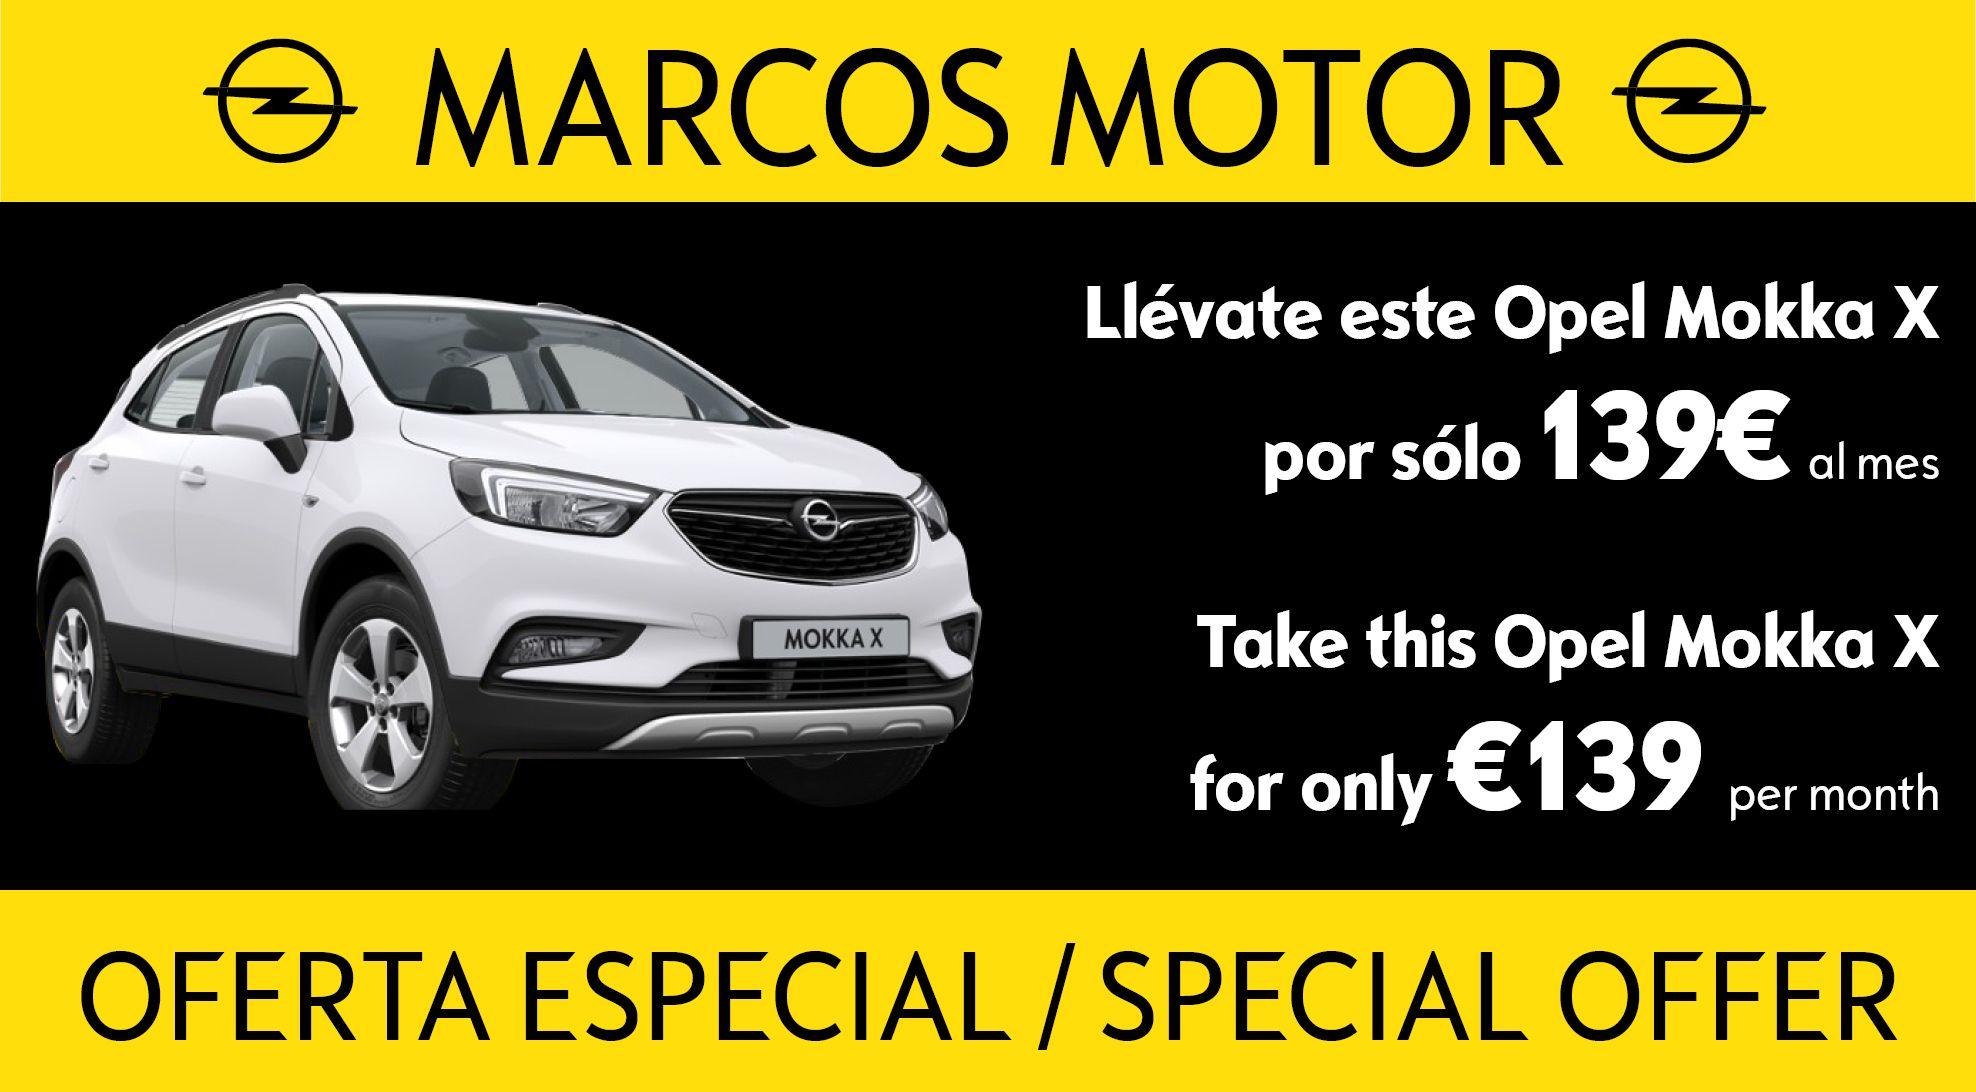 Oferta Opel Mokka X 139€ al mes